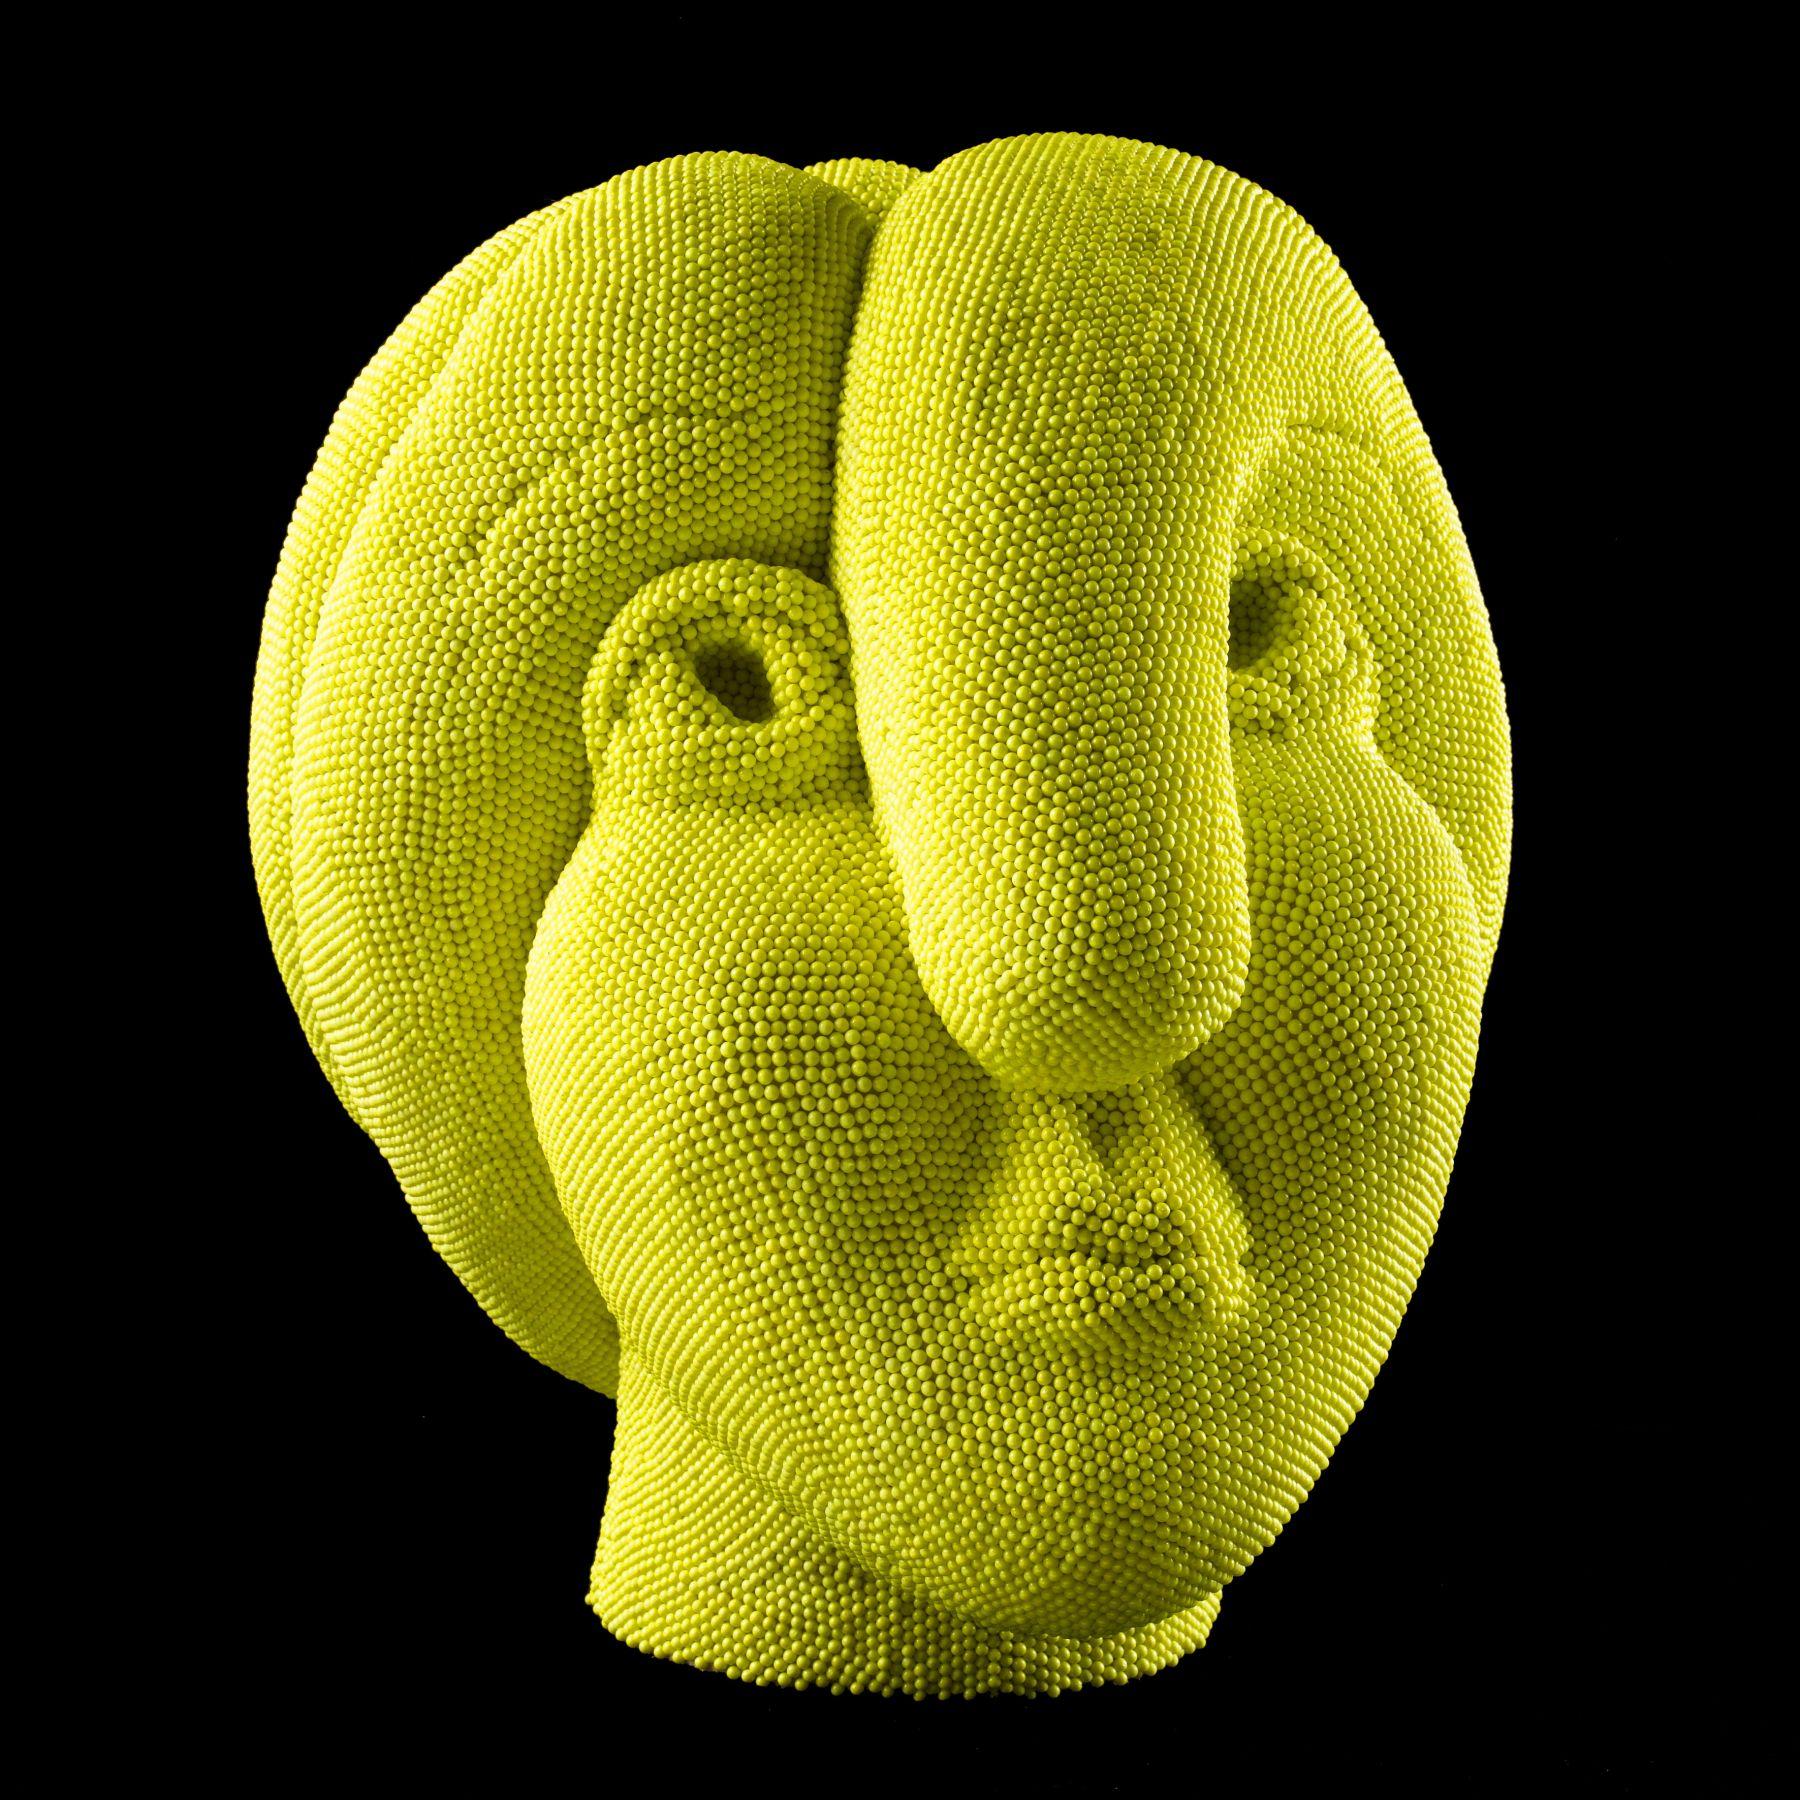 david mach, Yellow Pearl, 2012, yellow plastic pins on foam, 16 1/2 x 14 1/2 x 14 1/2 inches